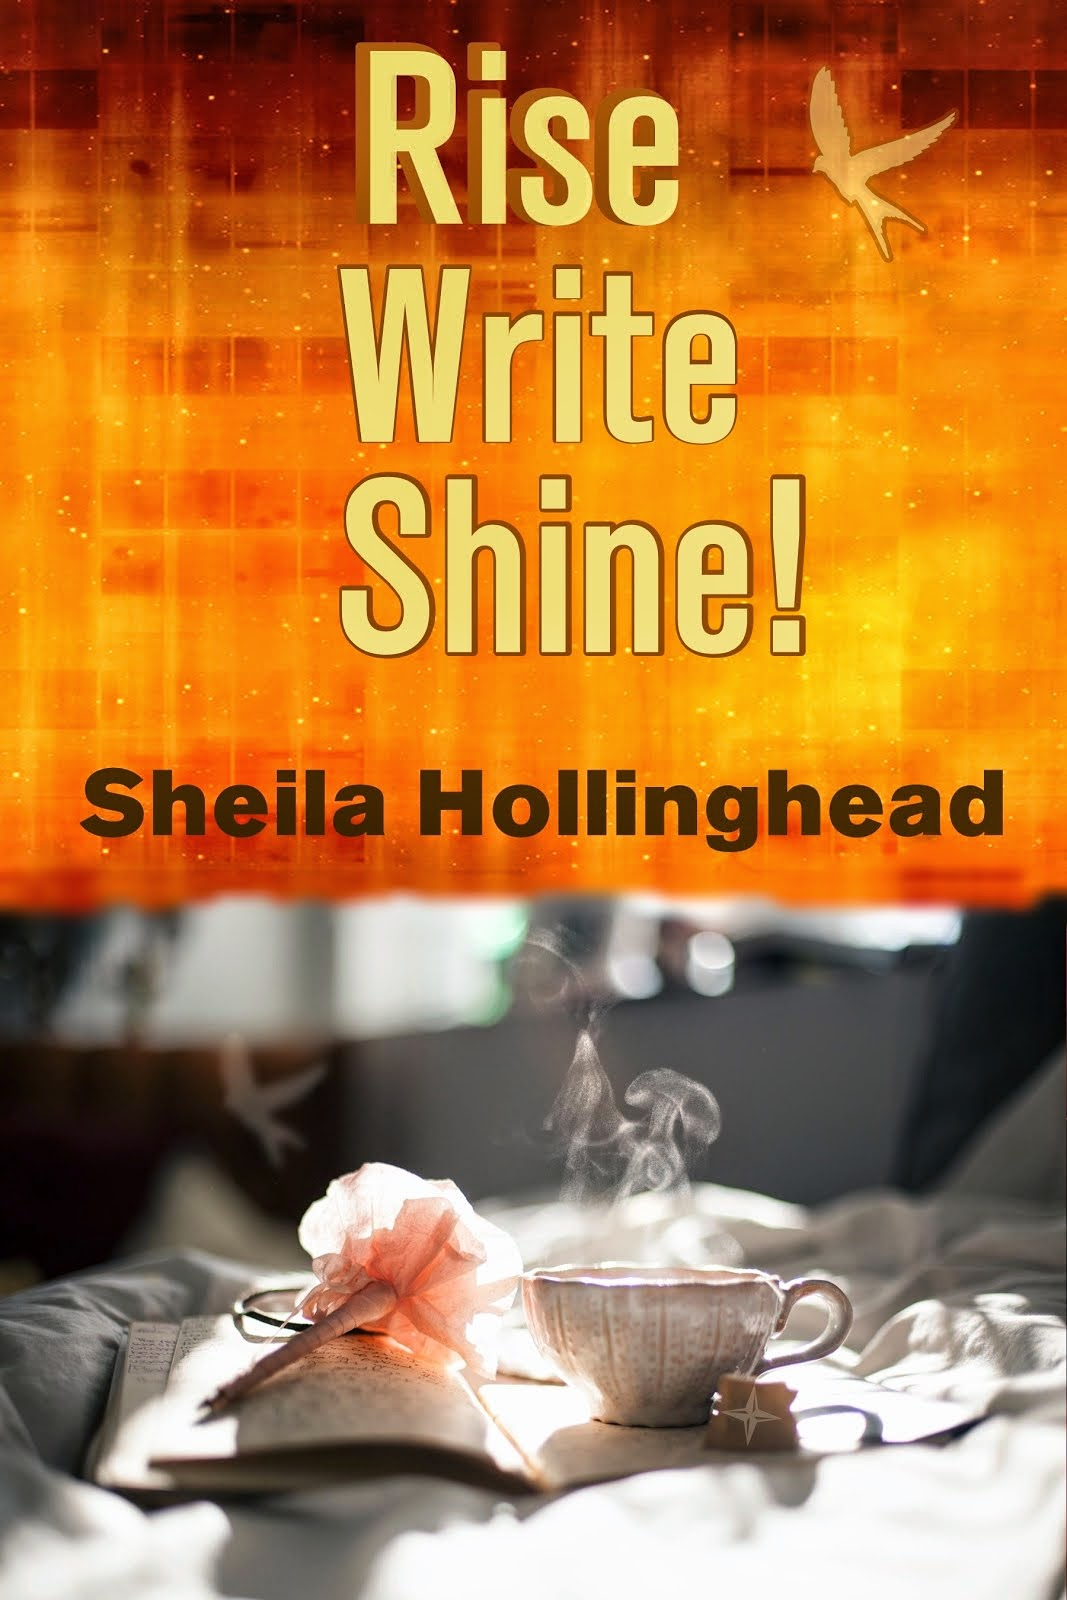 Rise, Write, Shine!